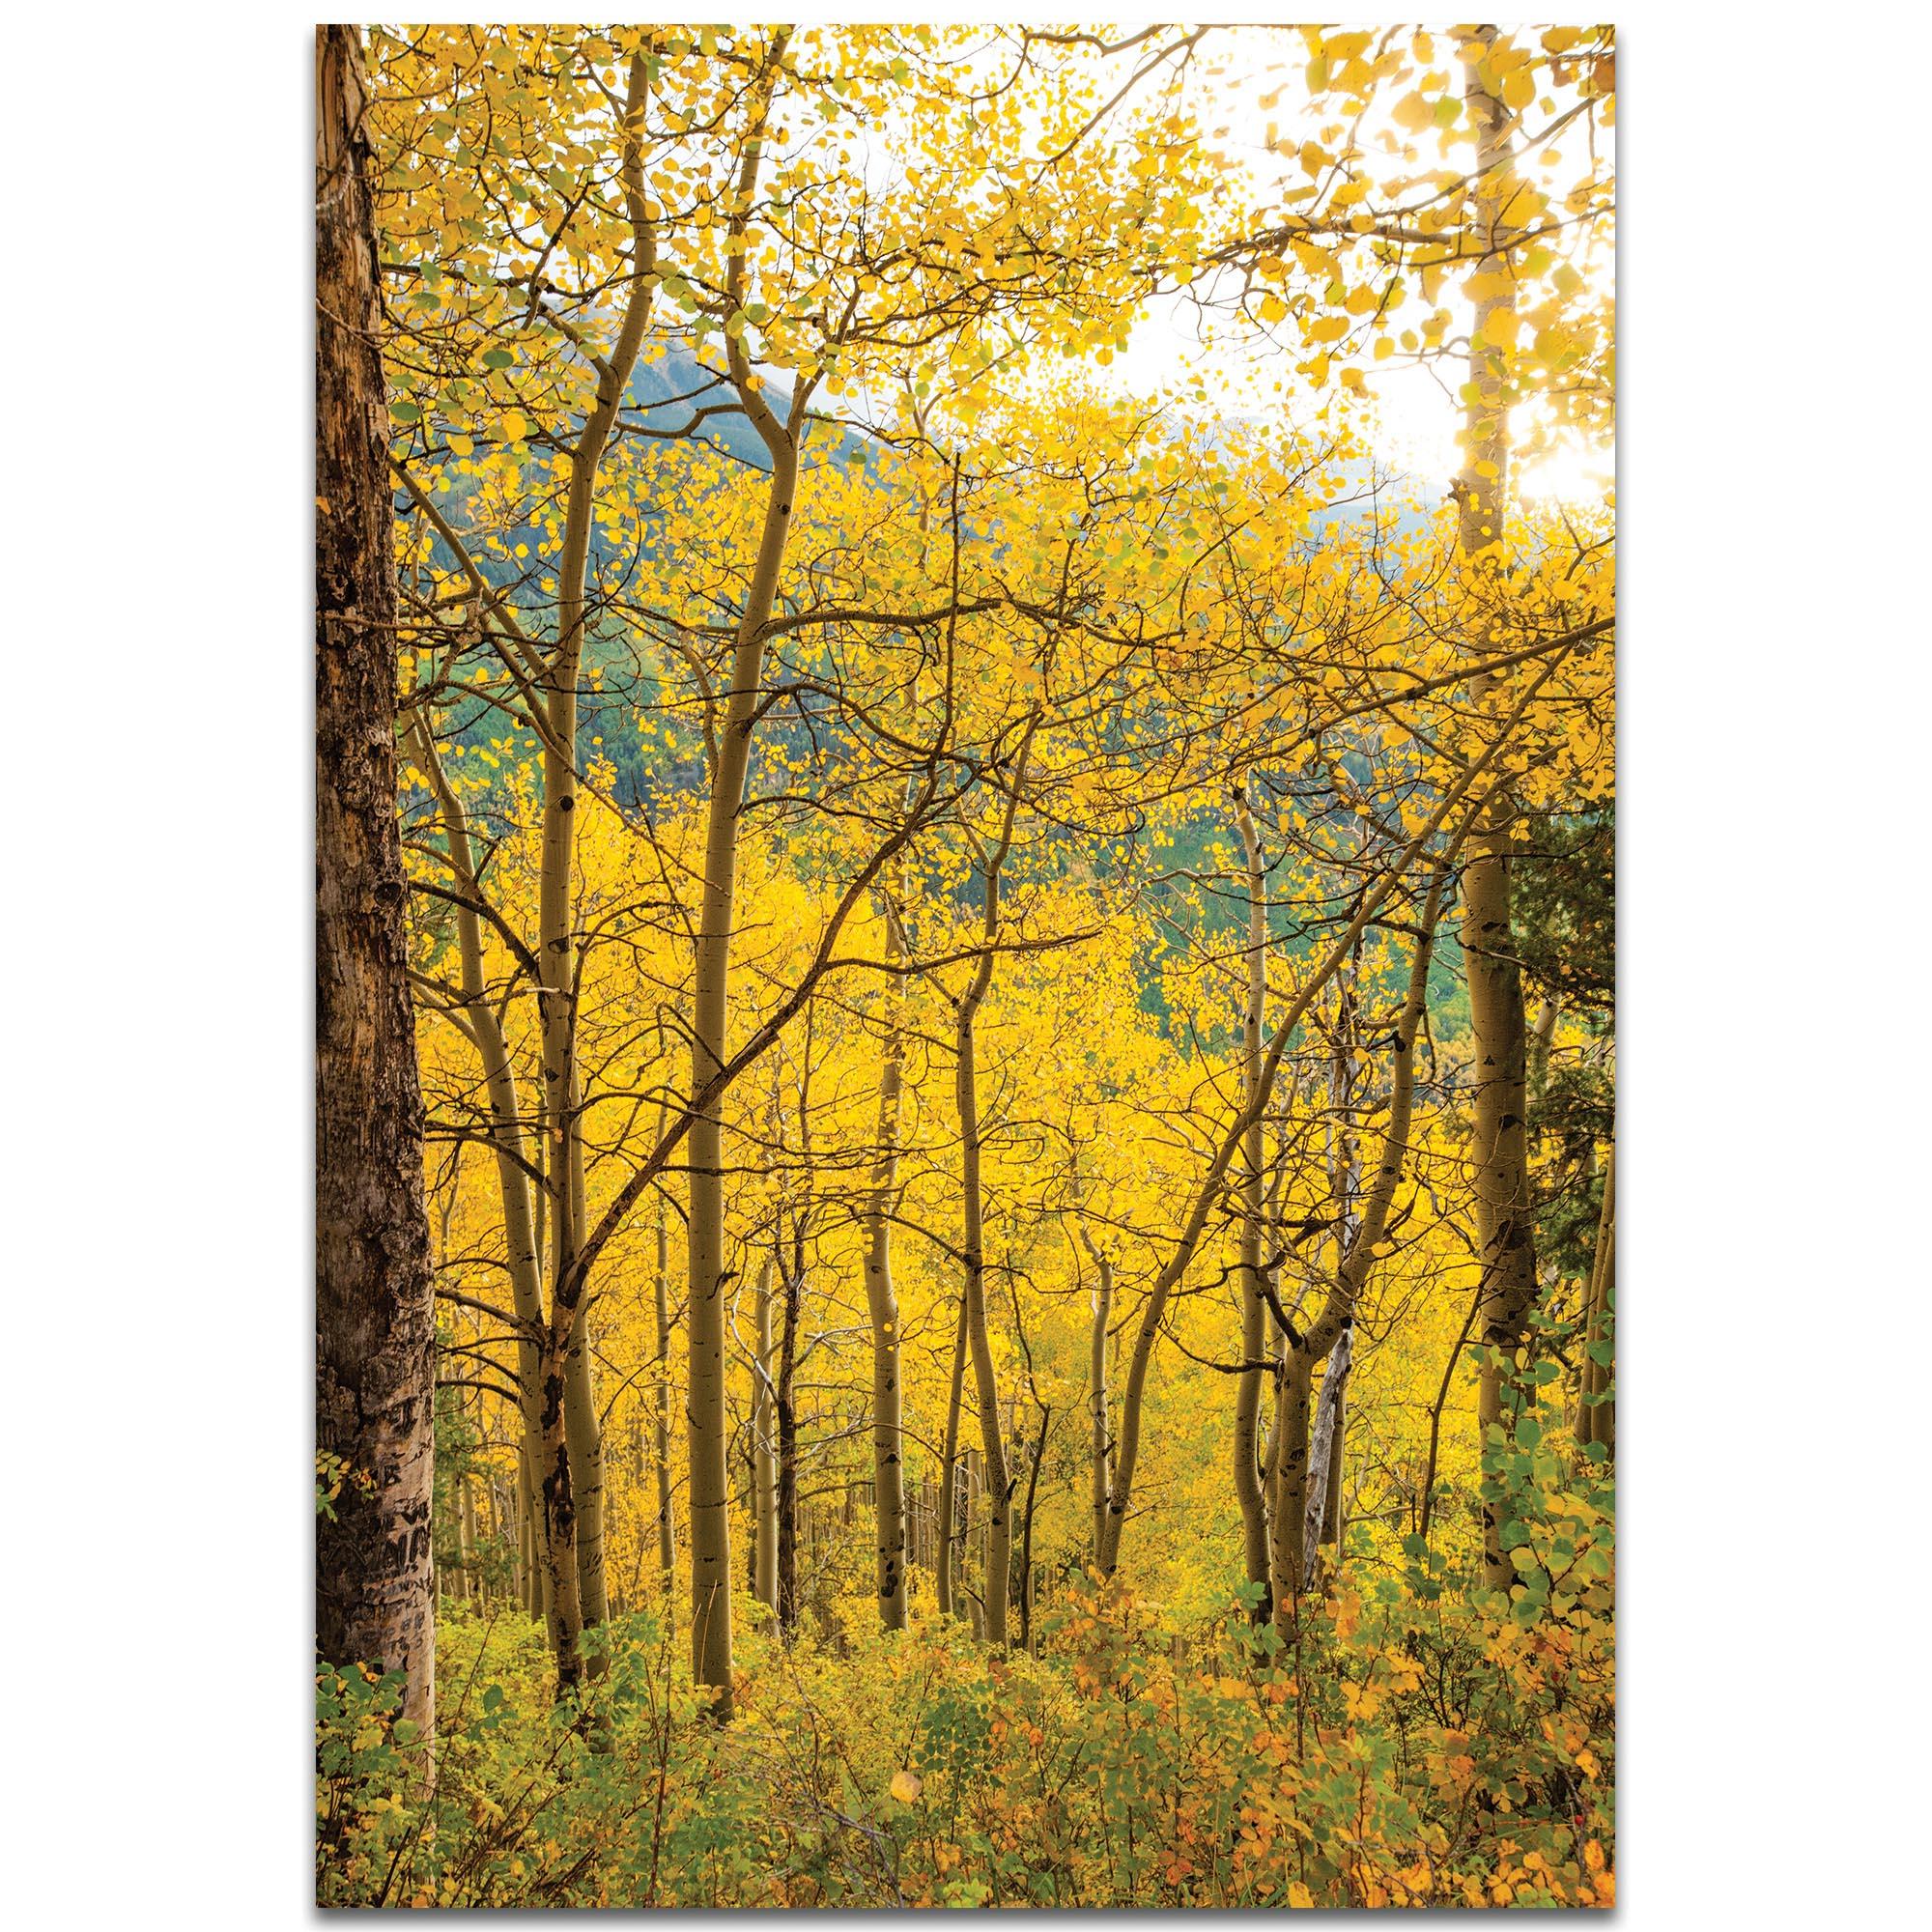 Landscape Photography 'Aspen Path' - Autumn Nature Art on Metal or Plexiglass